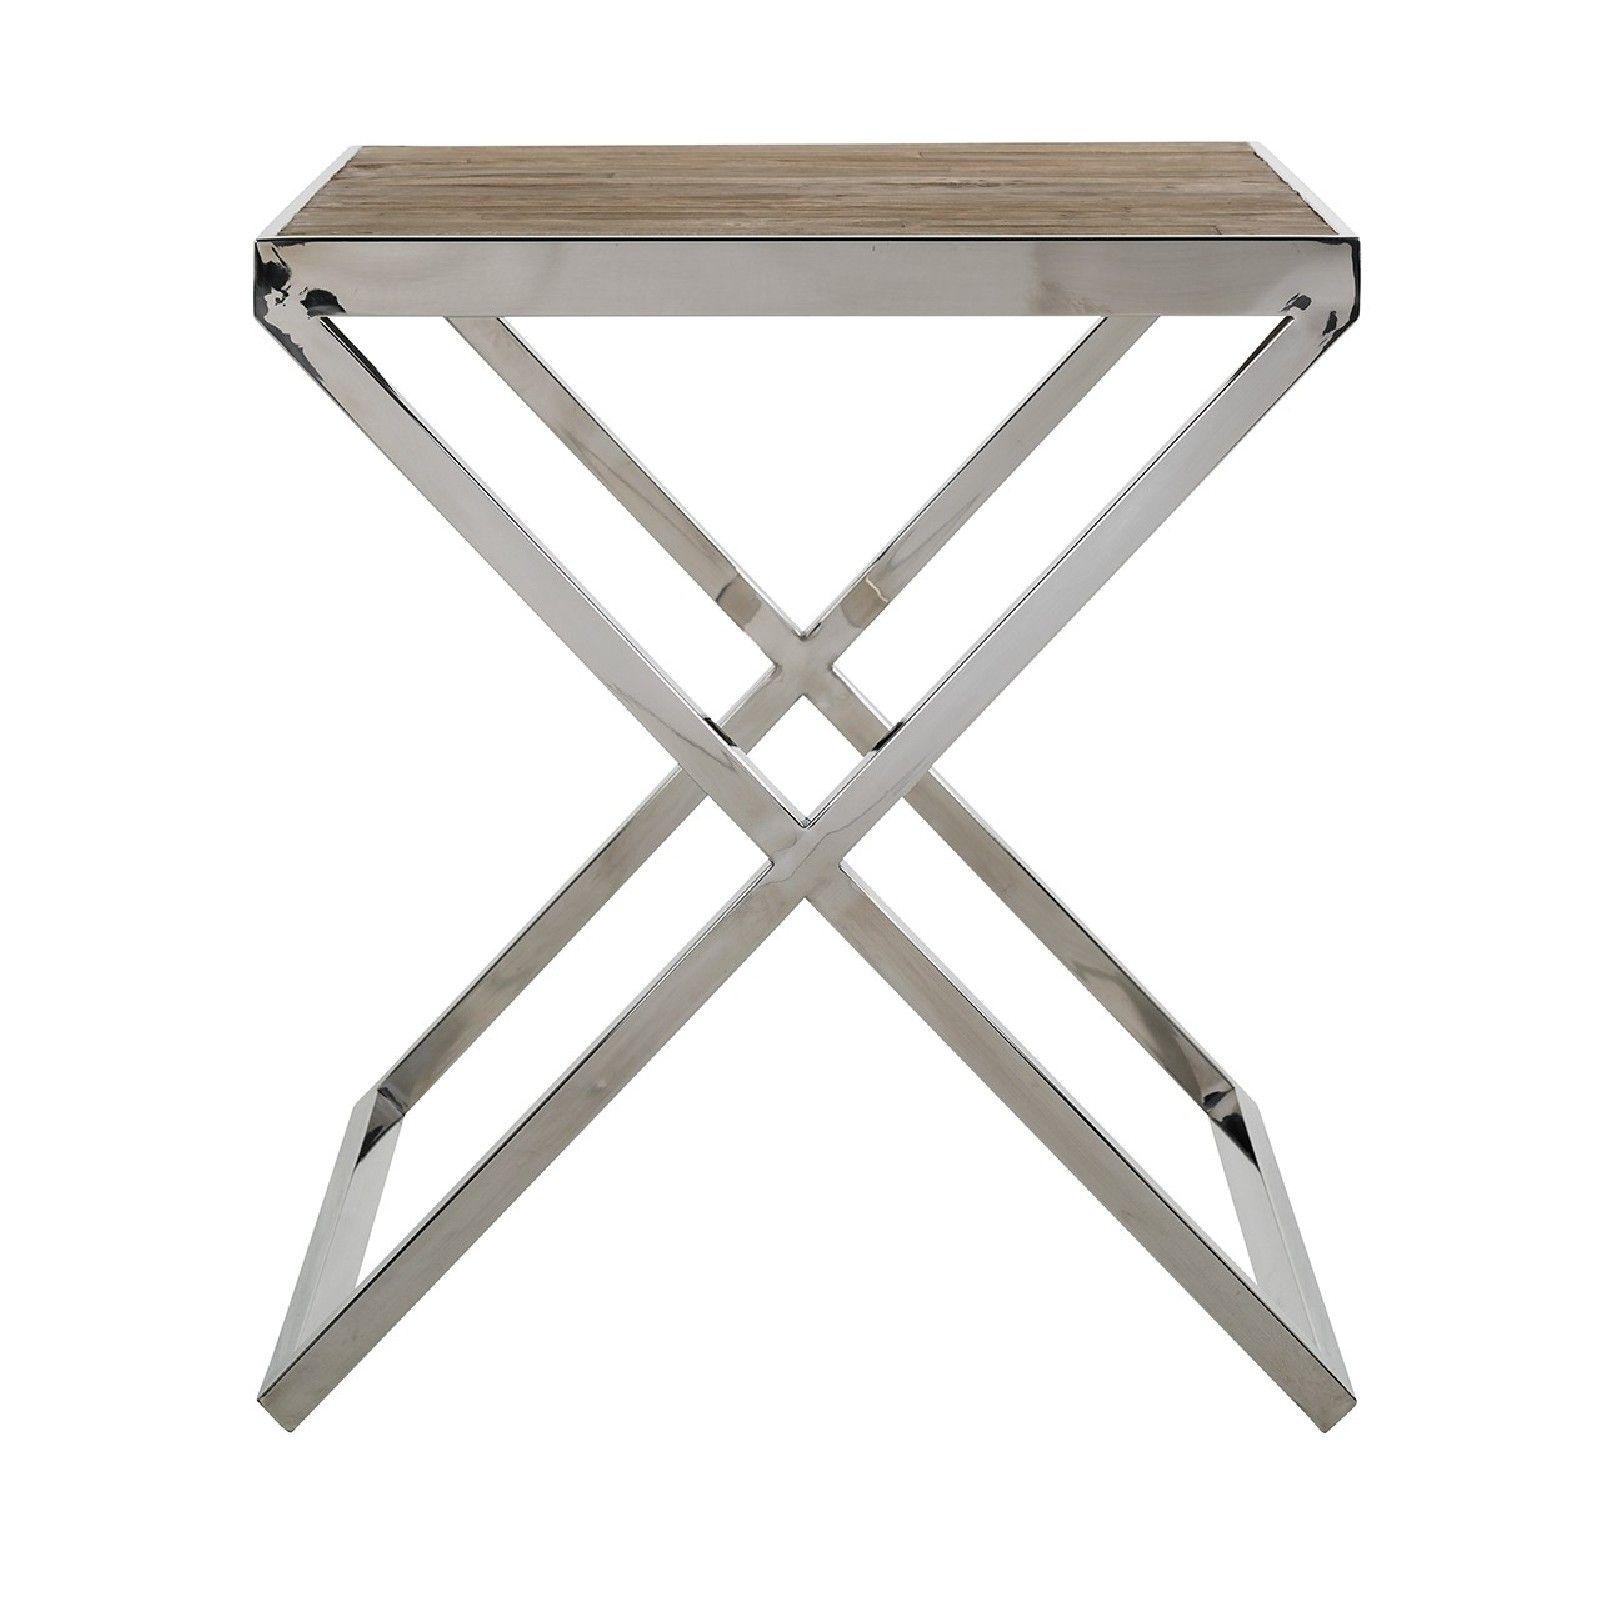 Table d'angle Redmond 55x55 Meuble Déco Tendance - 586